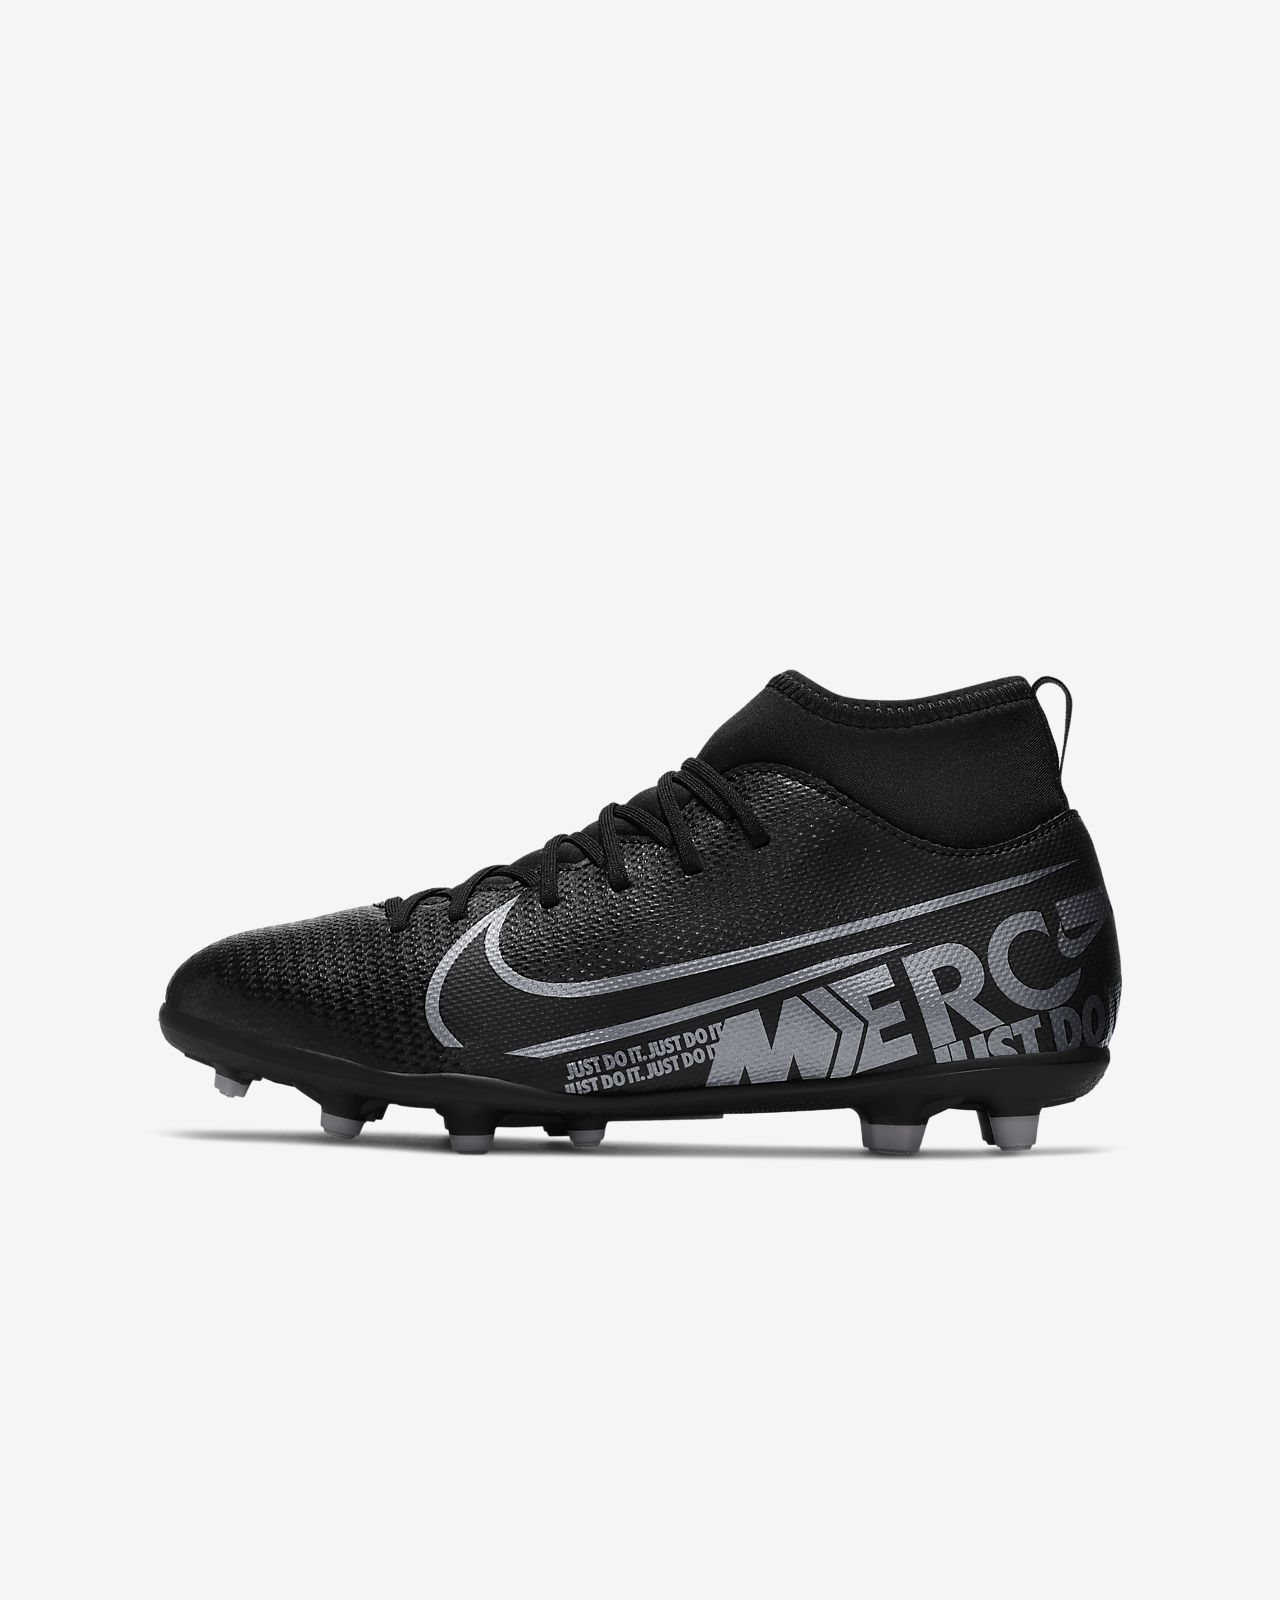 Nike Jr. Mercurial Superfly 7 Club MG Botas de fútbol multisuperficie - Niño/a y niño/a pequeño/a